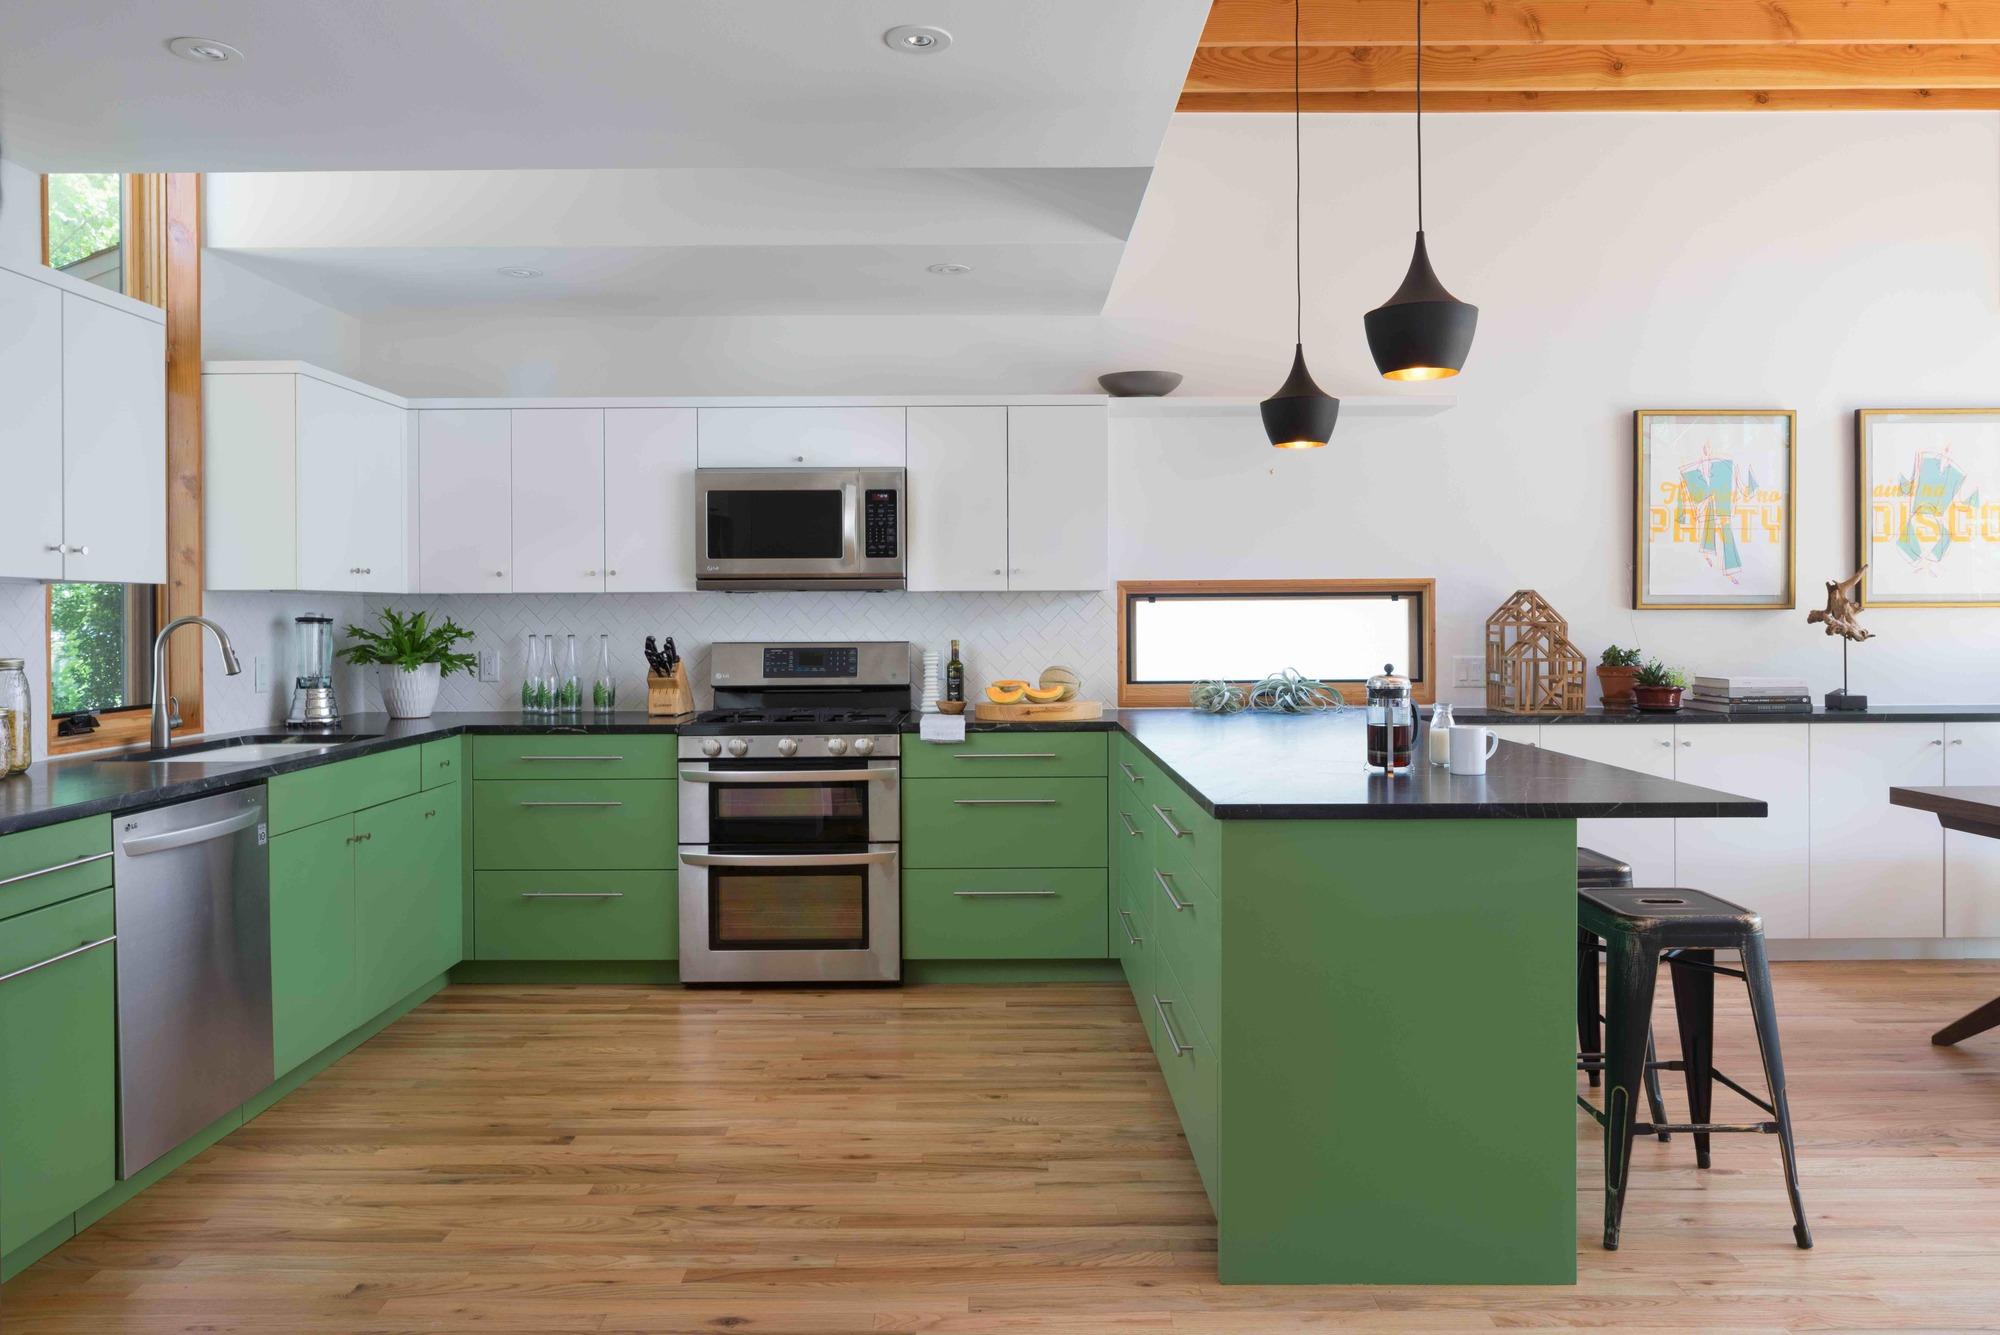 galer a de skyview murray legge architecture 4. Black Bedroom Furniture Sets. Home Design Ideas